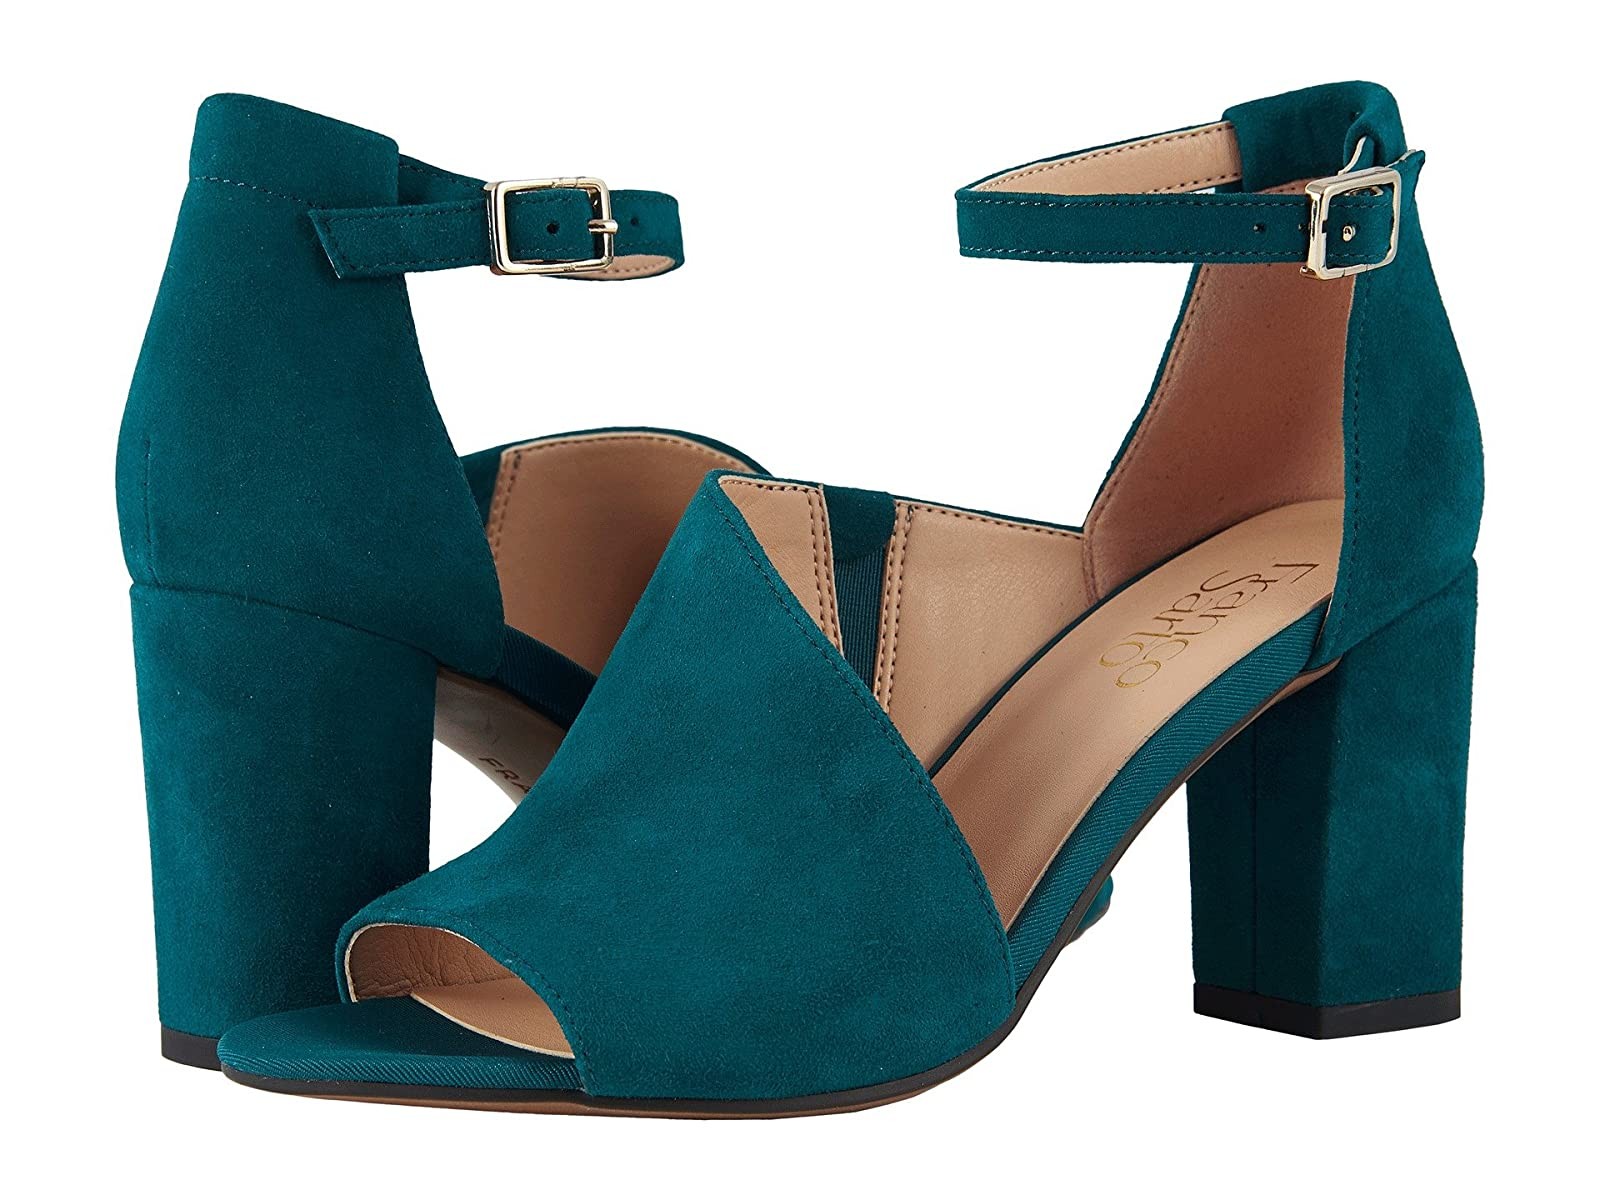 Franco Sarto GayleCheap and distinctive eye-catching shoes